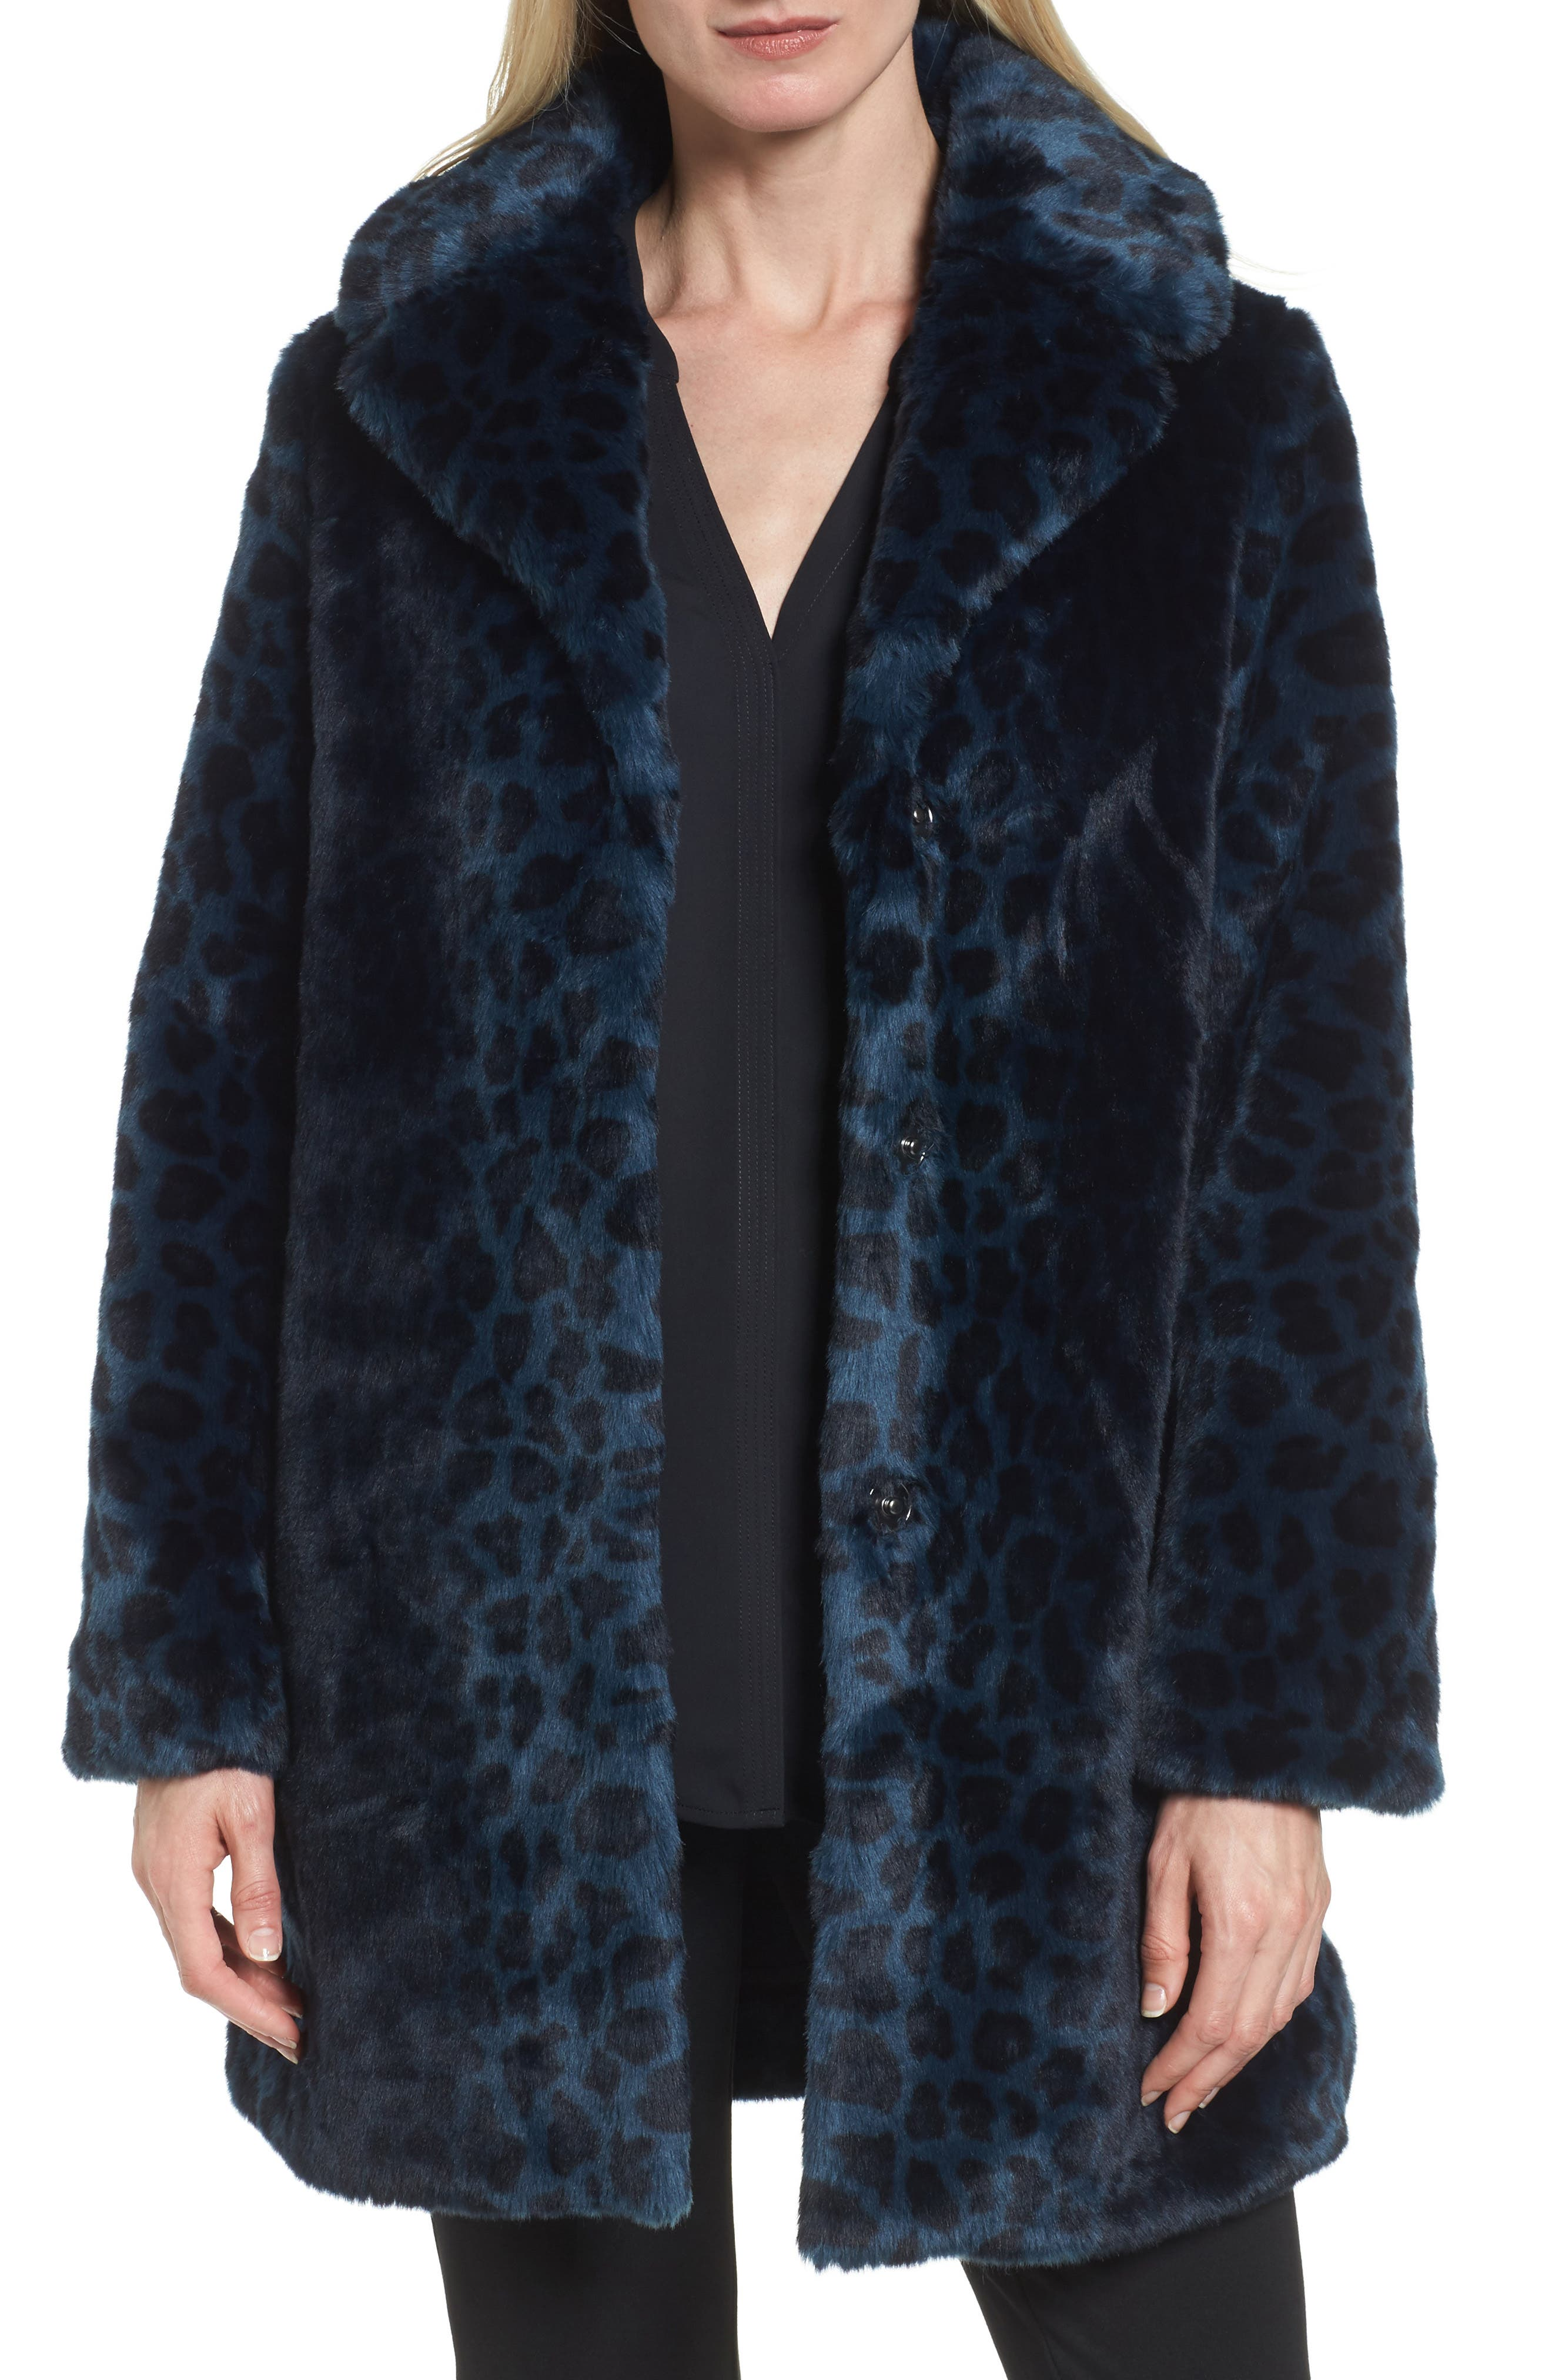 Reversible Cheetah Print Faux Fur Jacket,                         Main,                         color, Navy